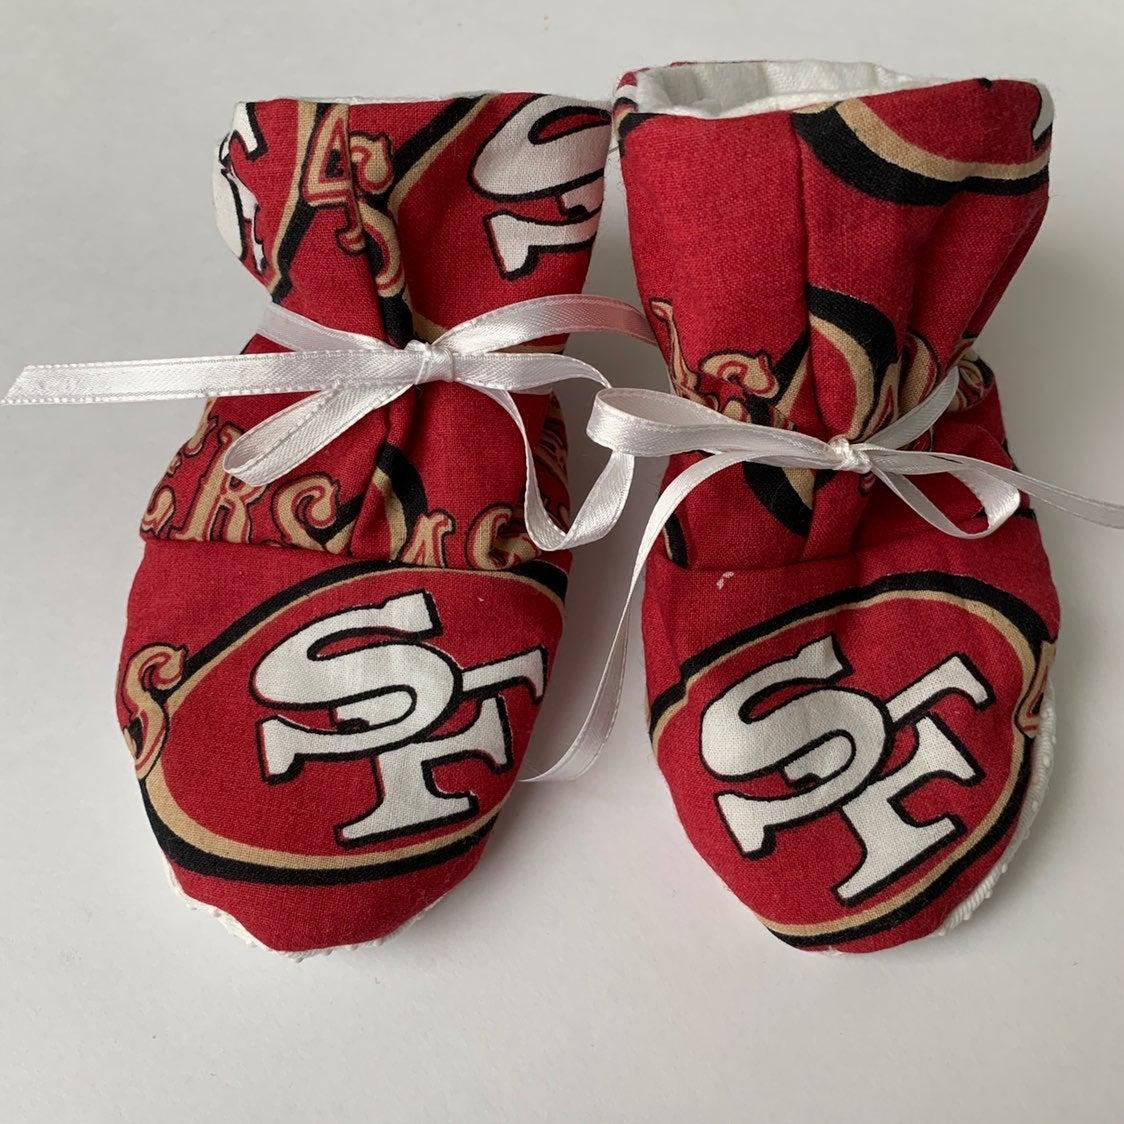 Handmade SF baby booties